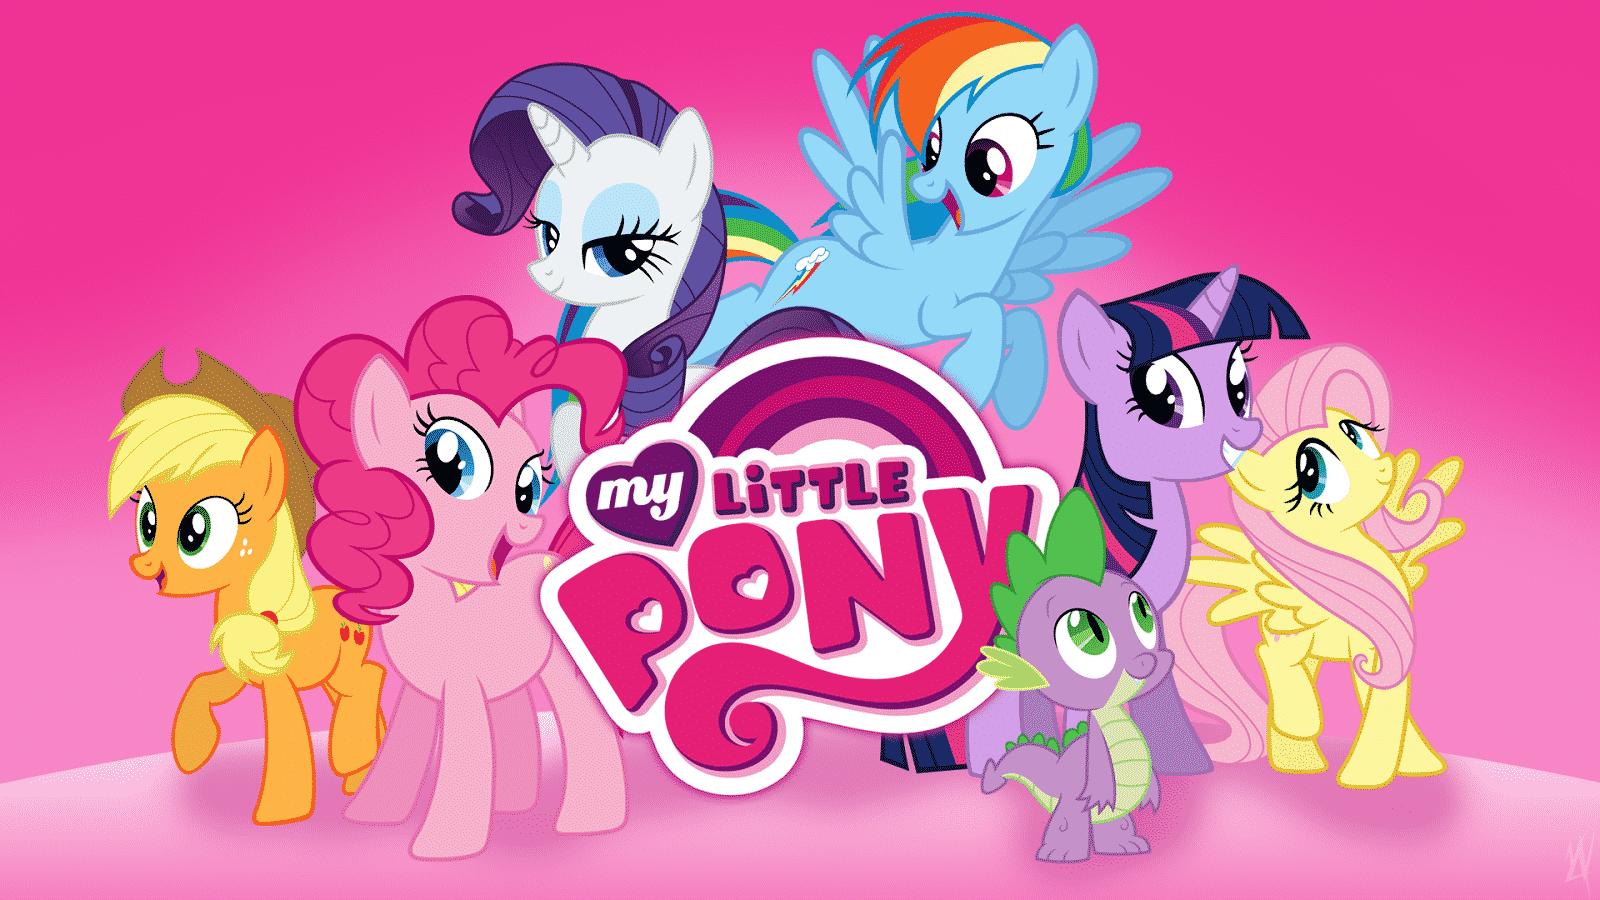 my little pony para colorear